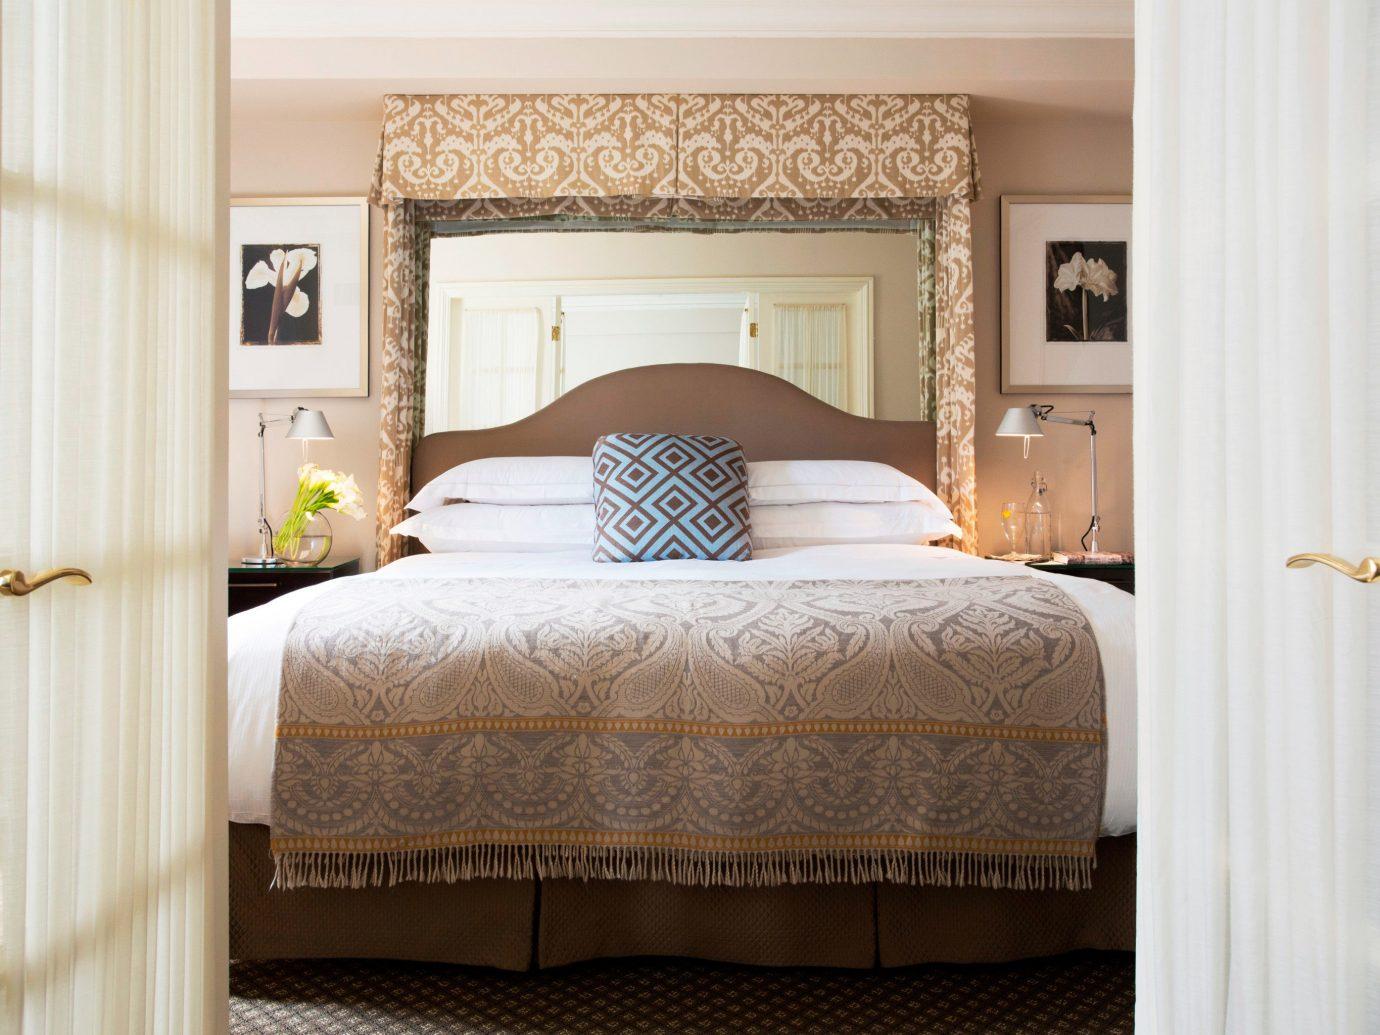 Bedroom Boutique City Classic Elegant Hotels Romantic bed indoor wall room hotel interior design furniture hardwood Suite floor bed sheet cottage bed frame textile duvet cover tan